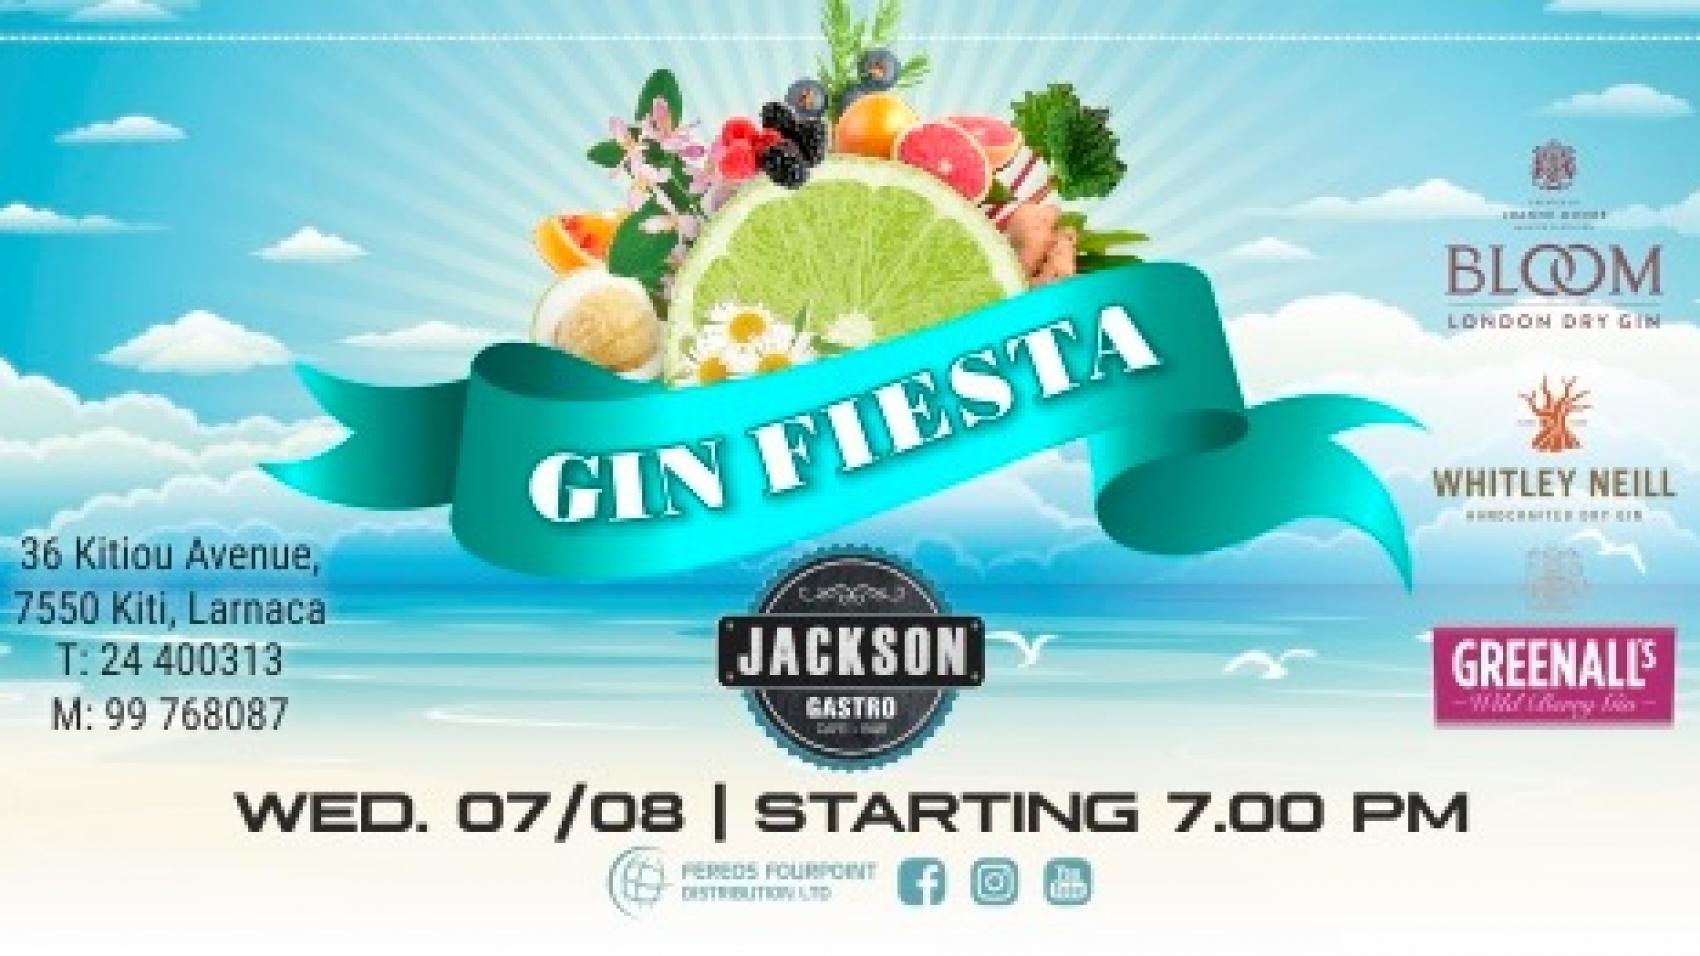 jackson-cafe-event-gin-fiesta